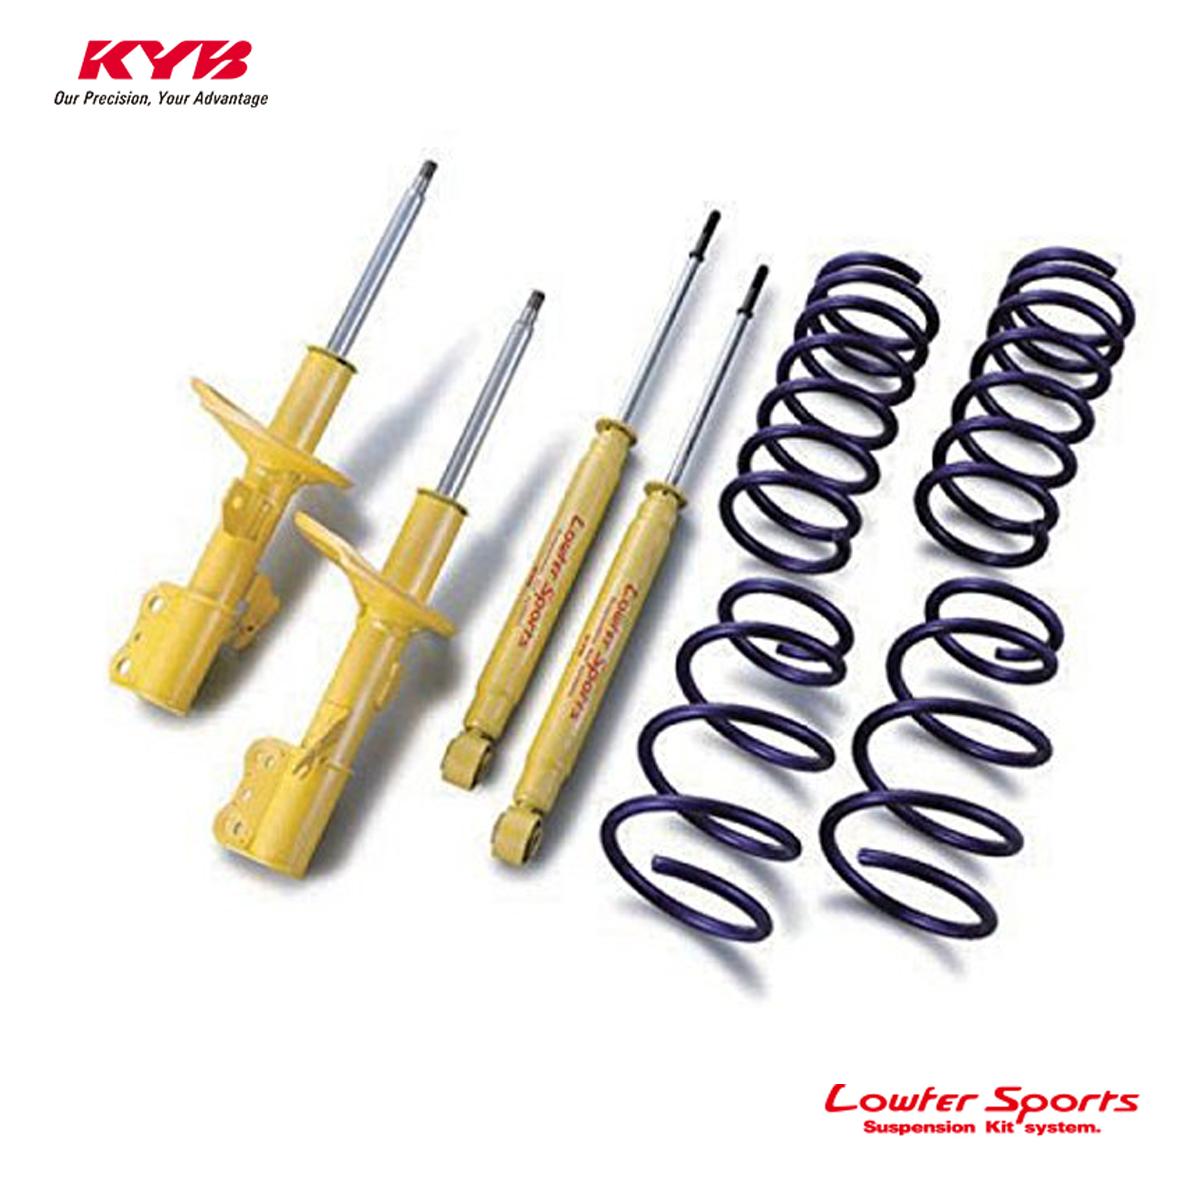 KYB カヤバ ファンカーゴ NCP25 ショックアブソーバー サスペンションキット Lowfer Sports LKIT-NCP25 配送先条件有り